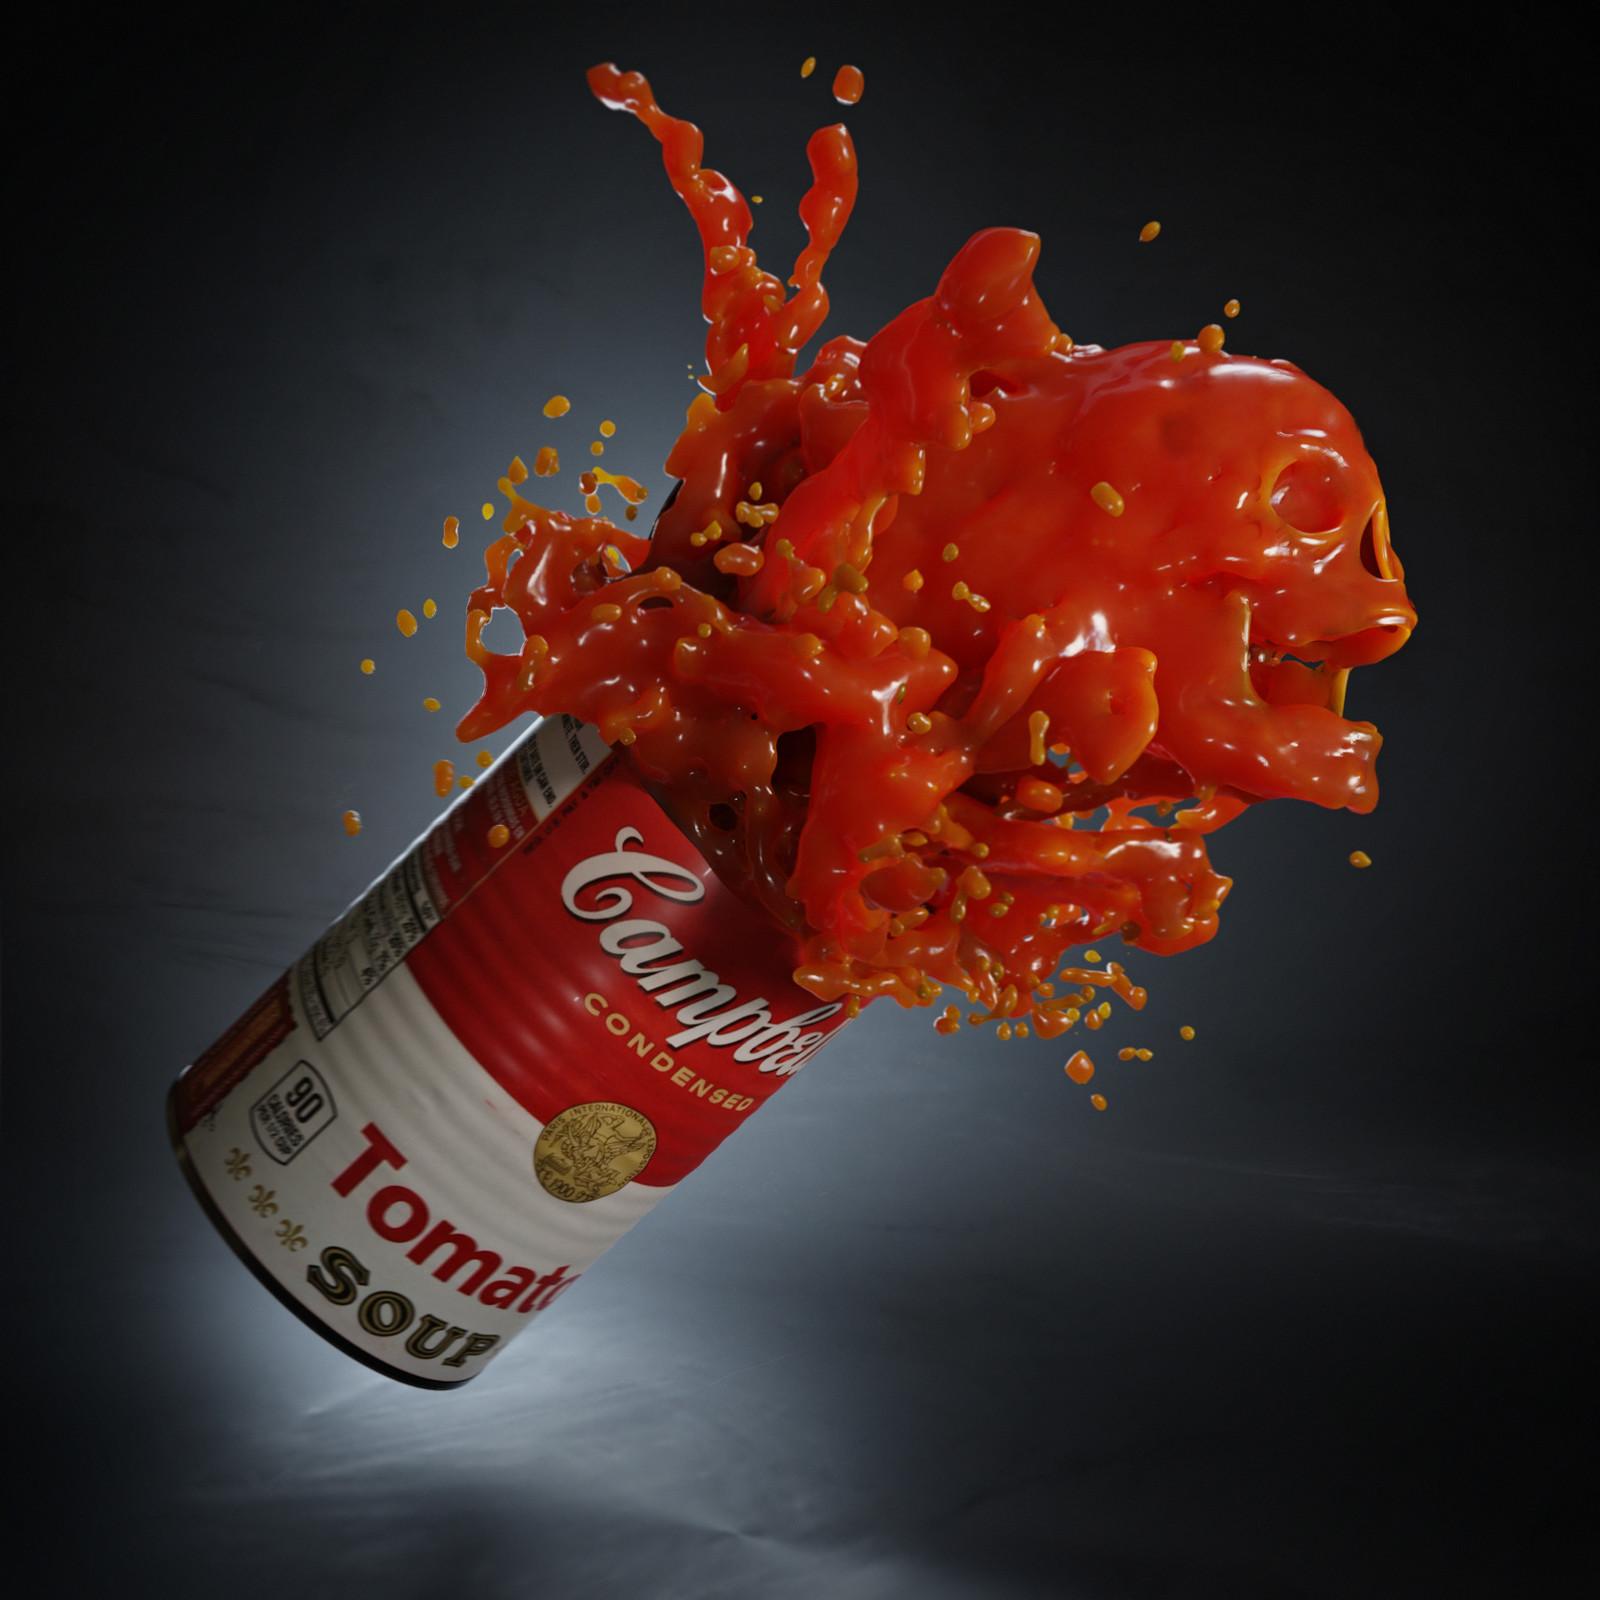 Tomato Soup Rage